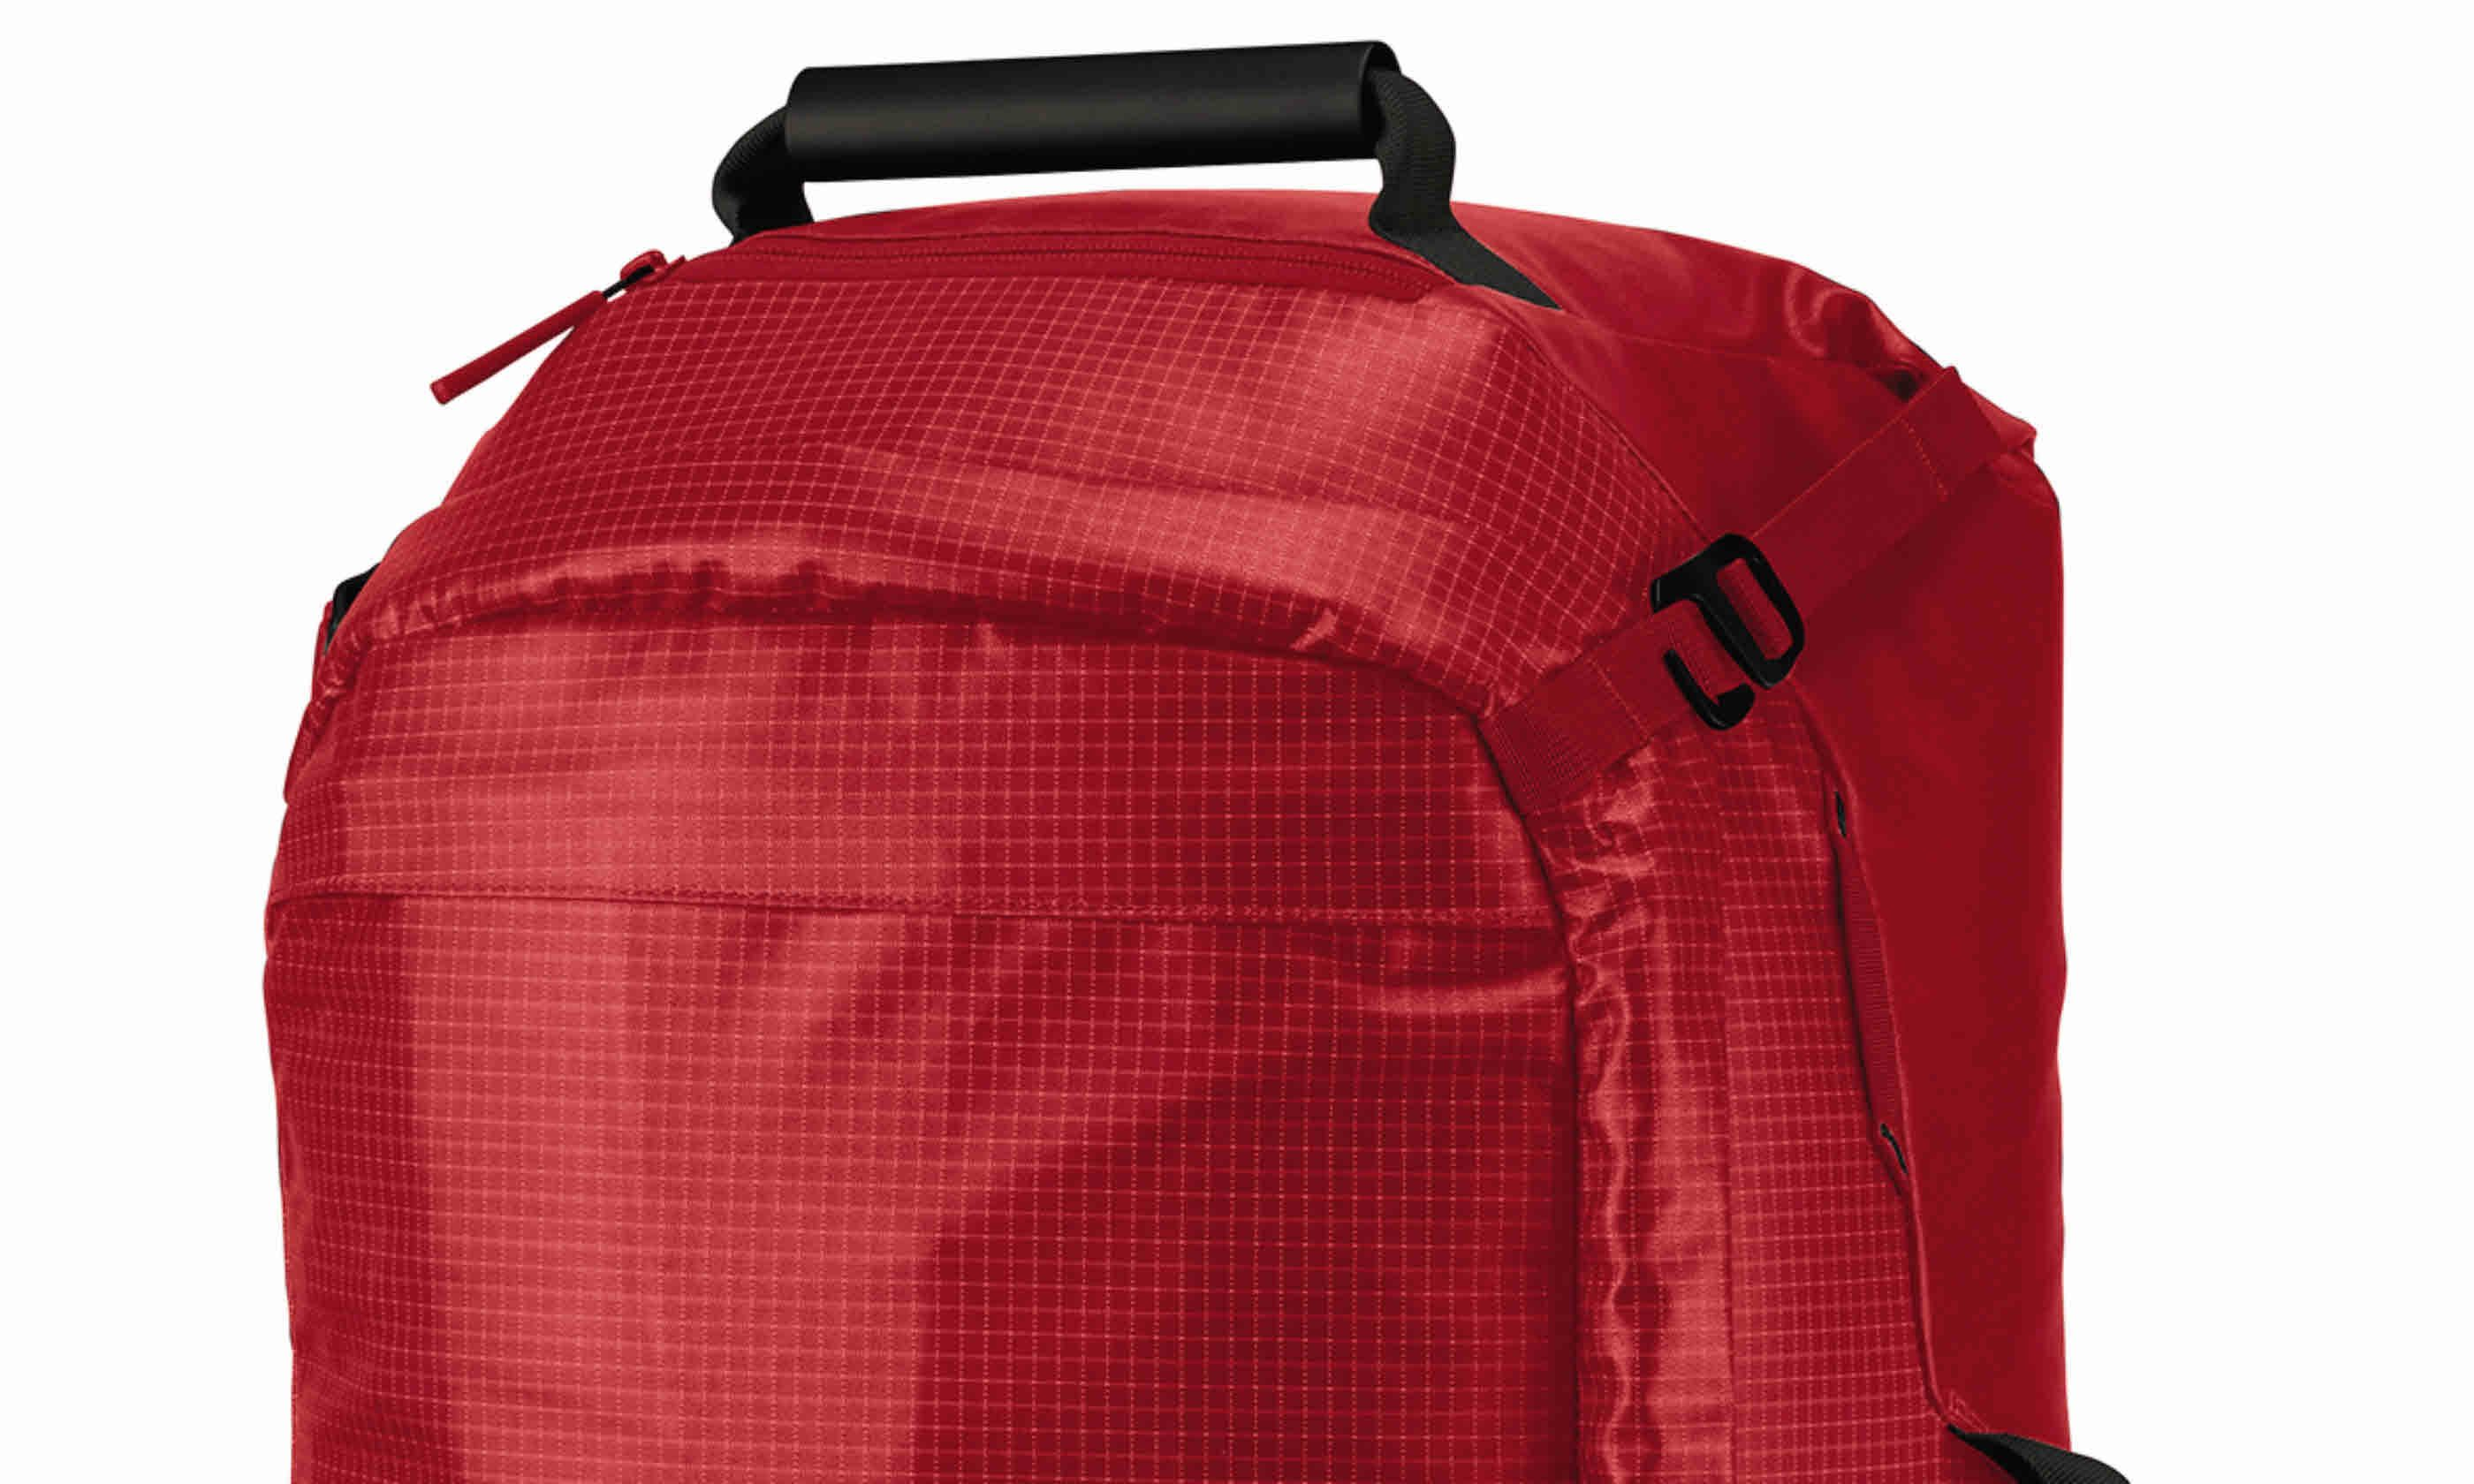 Lowe Alpine AT Kit Bag 80L